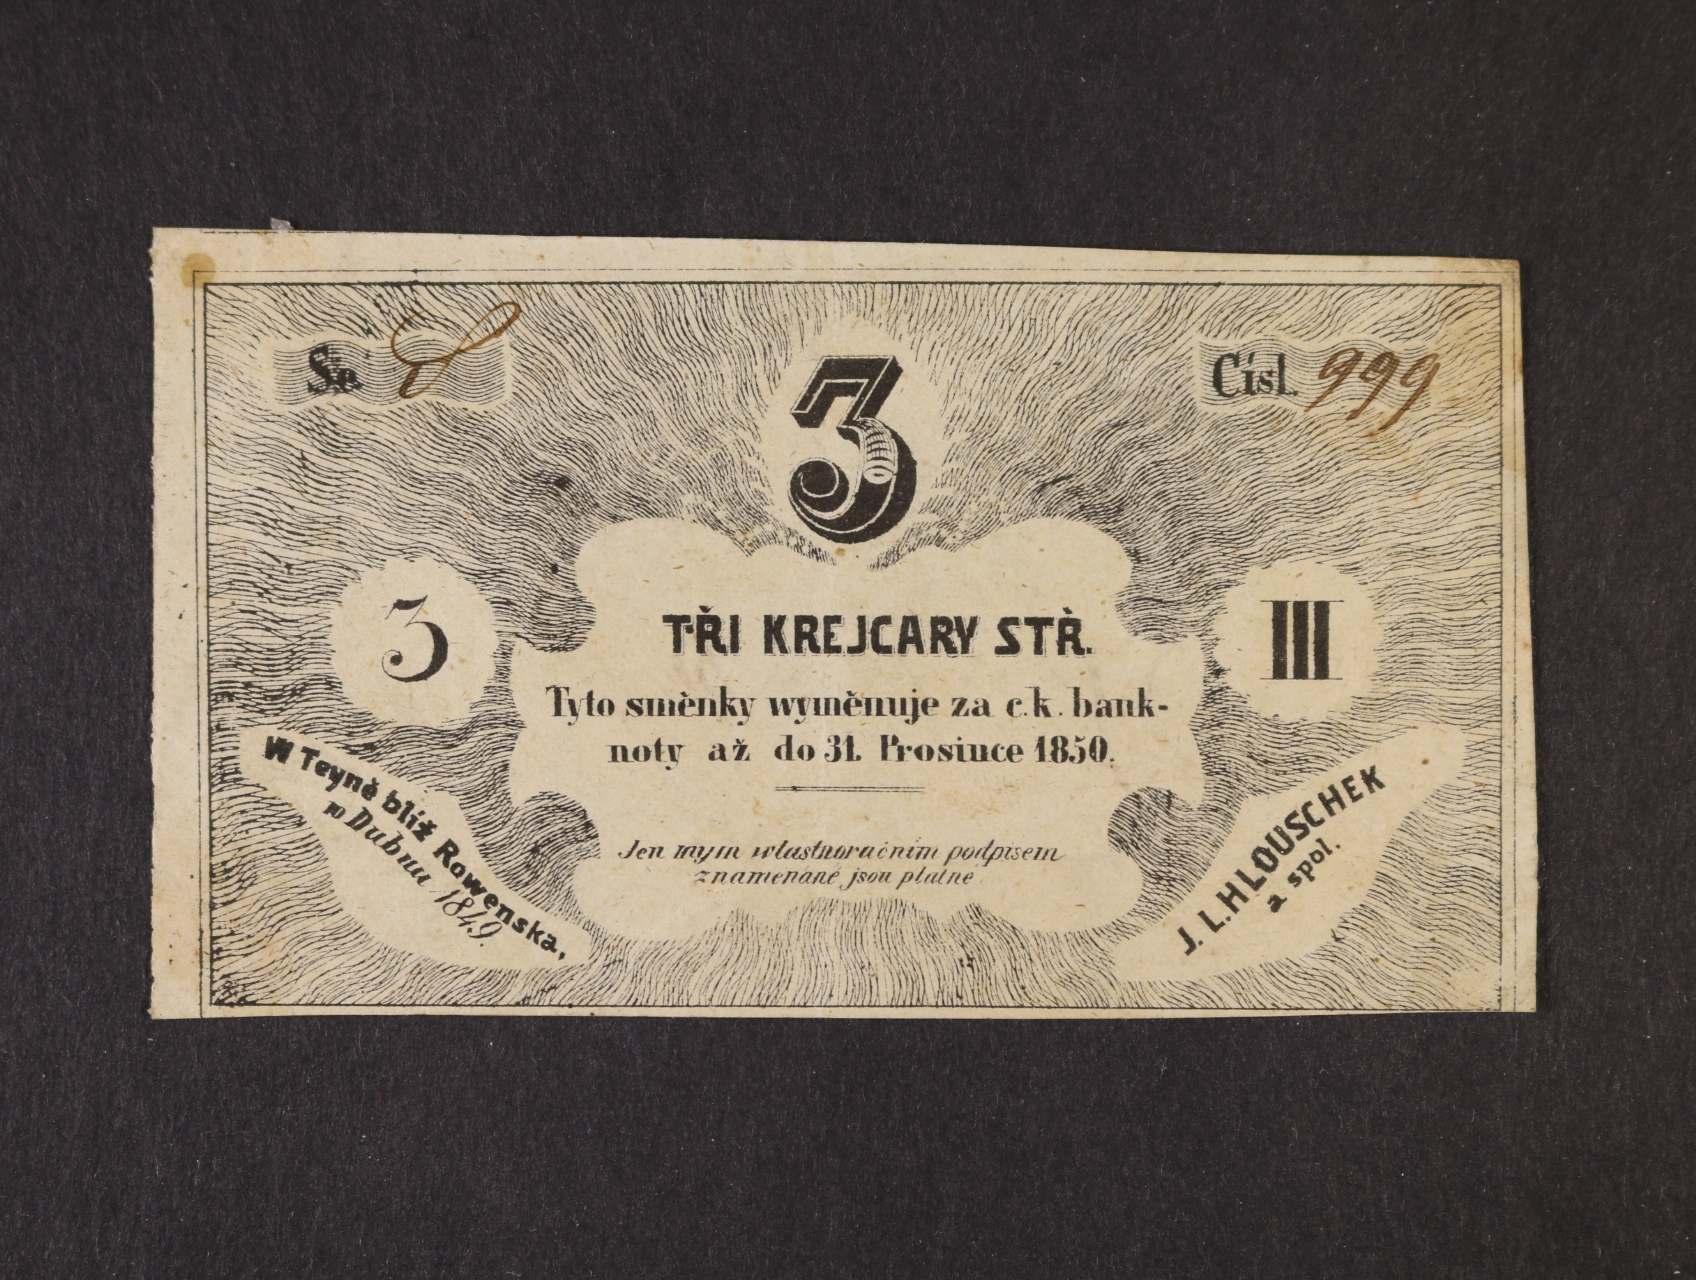 Teyn (Týn blíž Rowenska), 3 kr. stř. b.d. J.L.Hlouschek, V.R. 1345.02.c.O, na R raz. a podpis